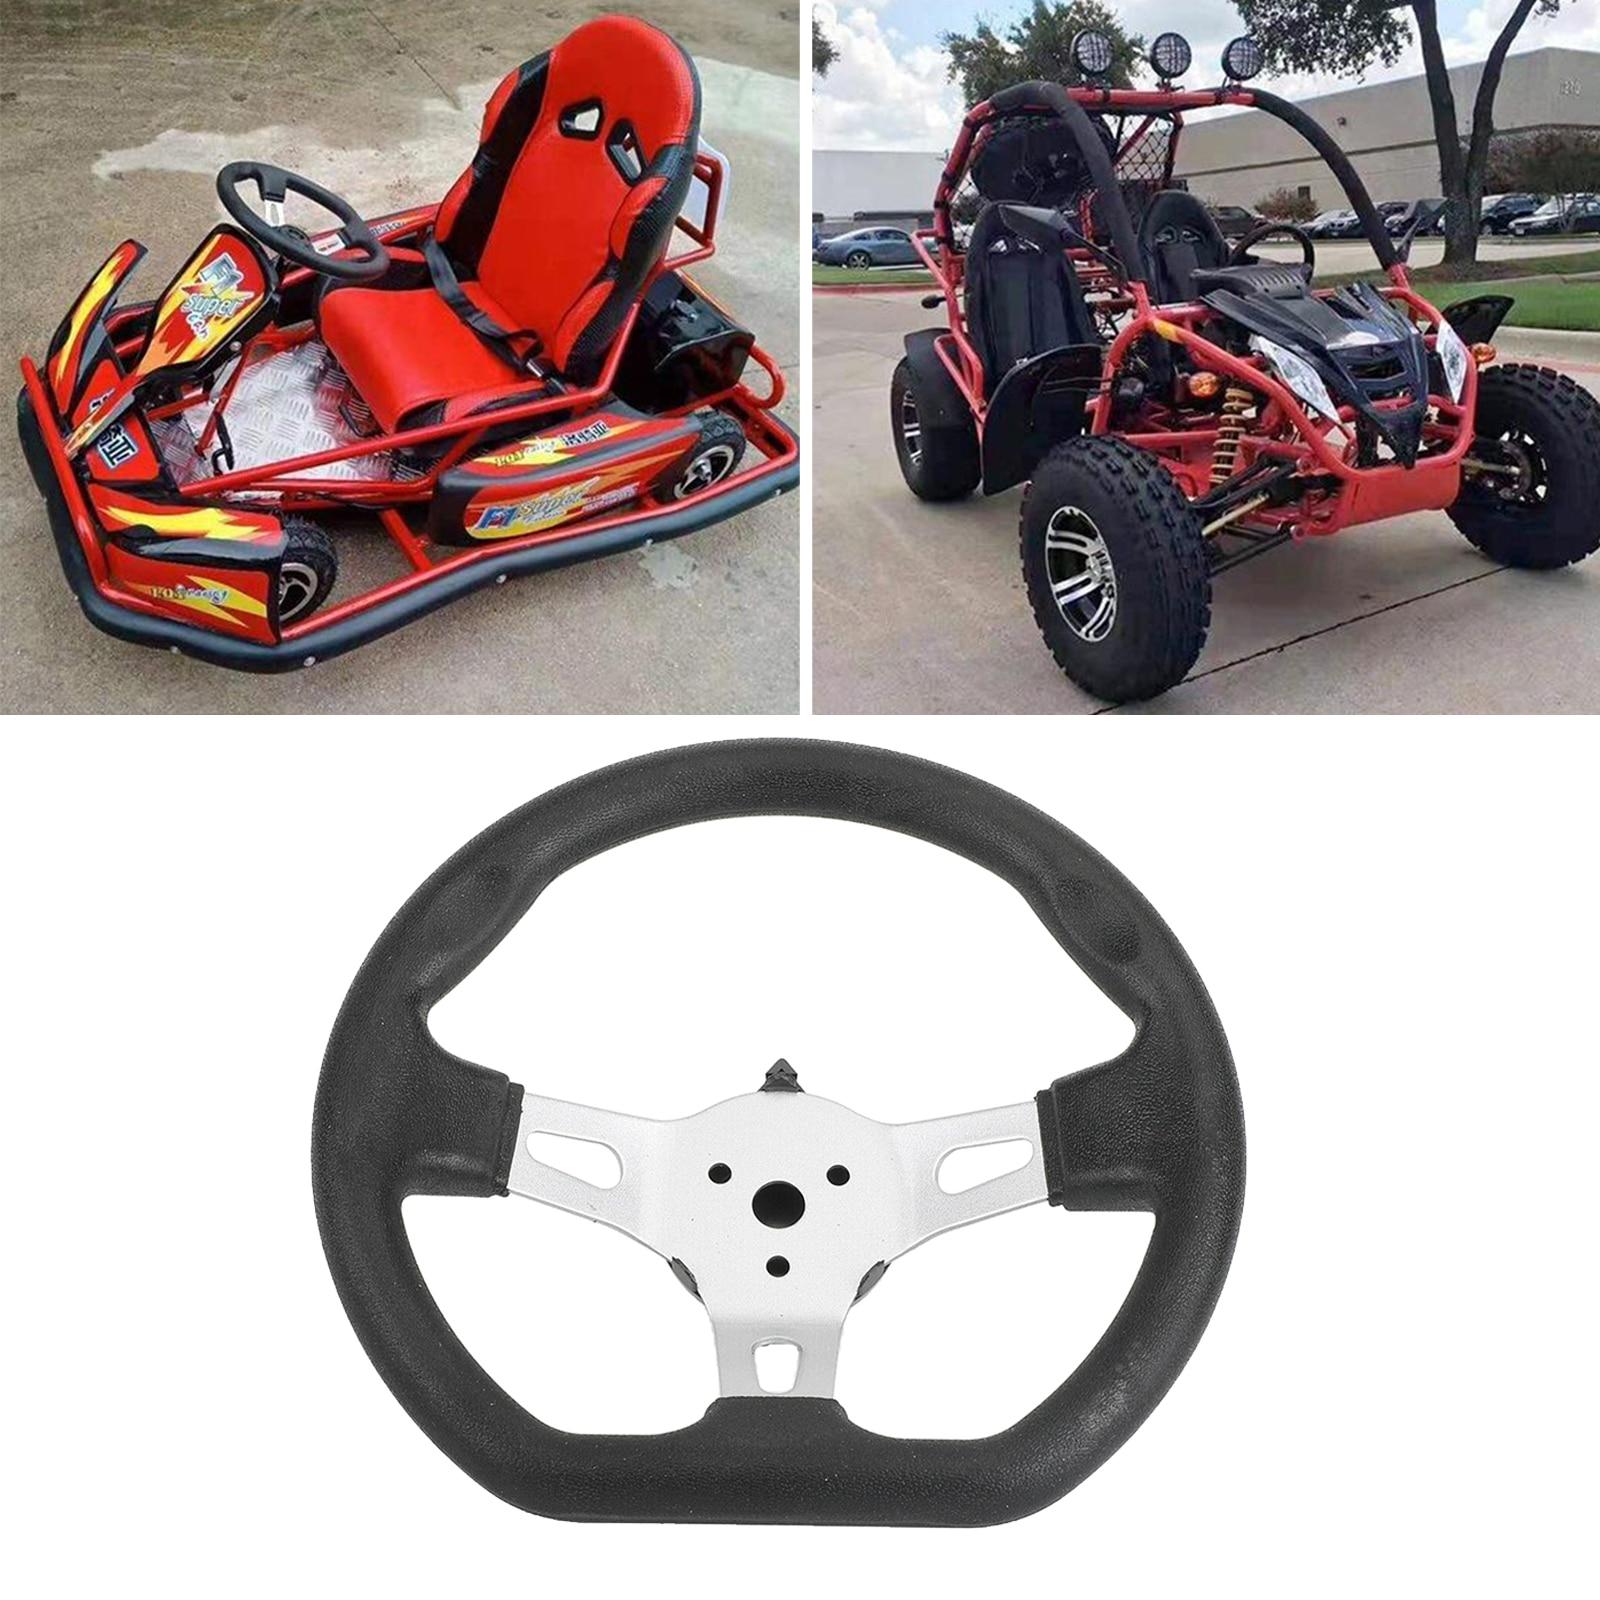 270mm Go Kart Steering Wheel Kart Parts Replacement For Go-Kart Buggy Racing Cart Accessory